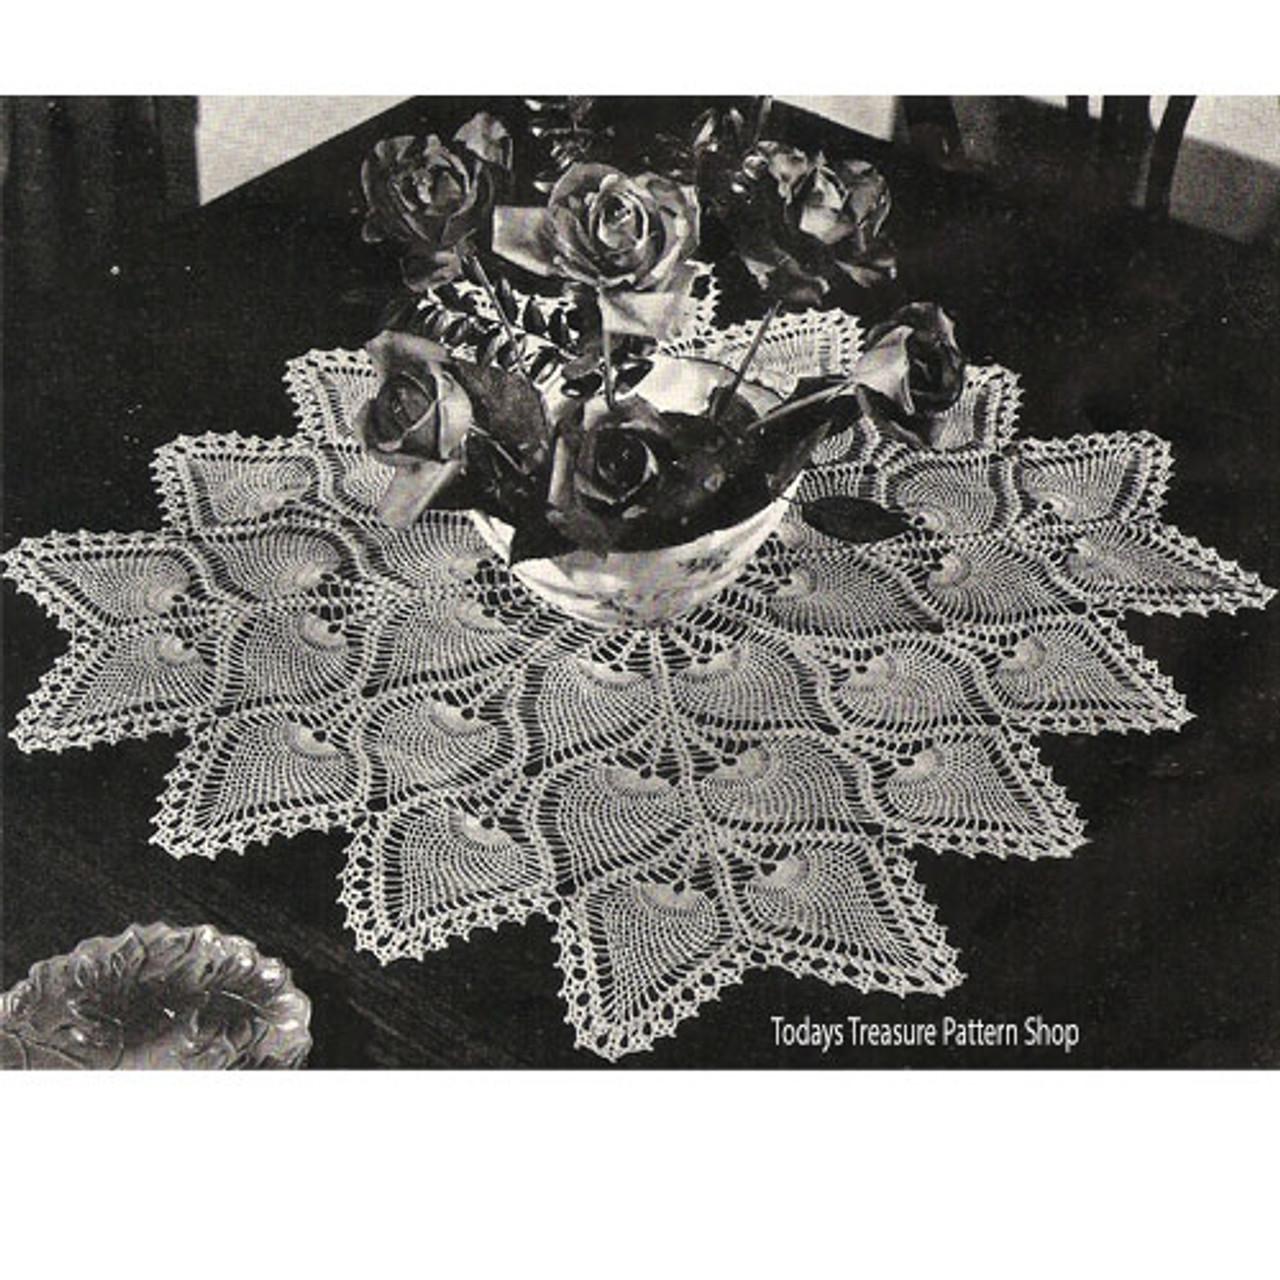 Crochet Pineapple Medallion Doily or Cloth Pattern